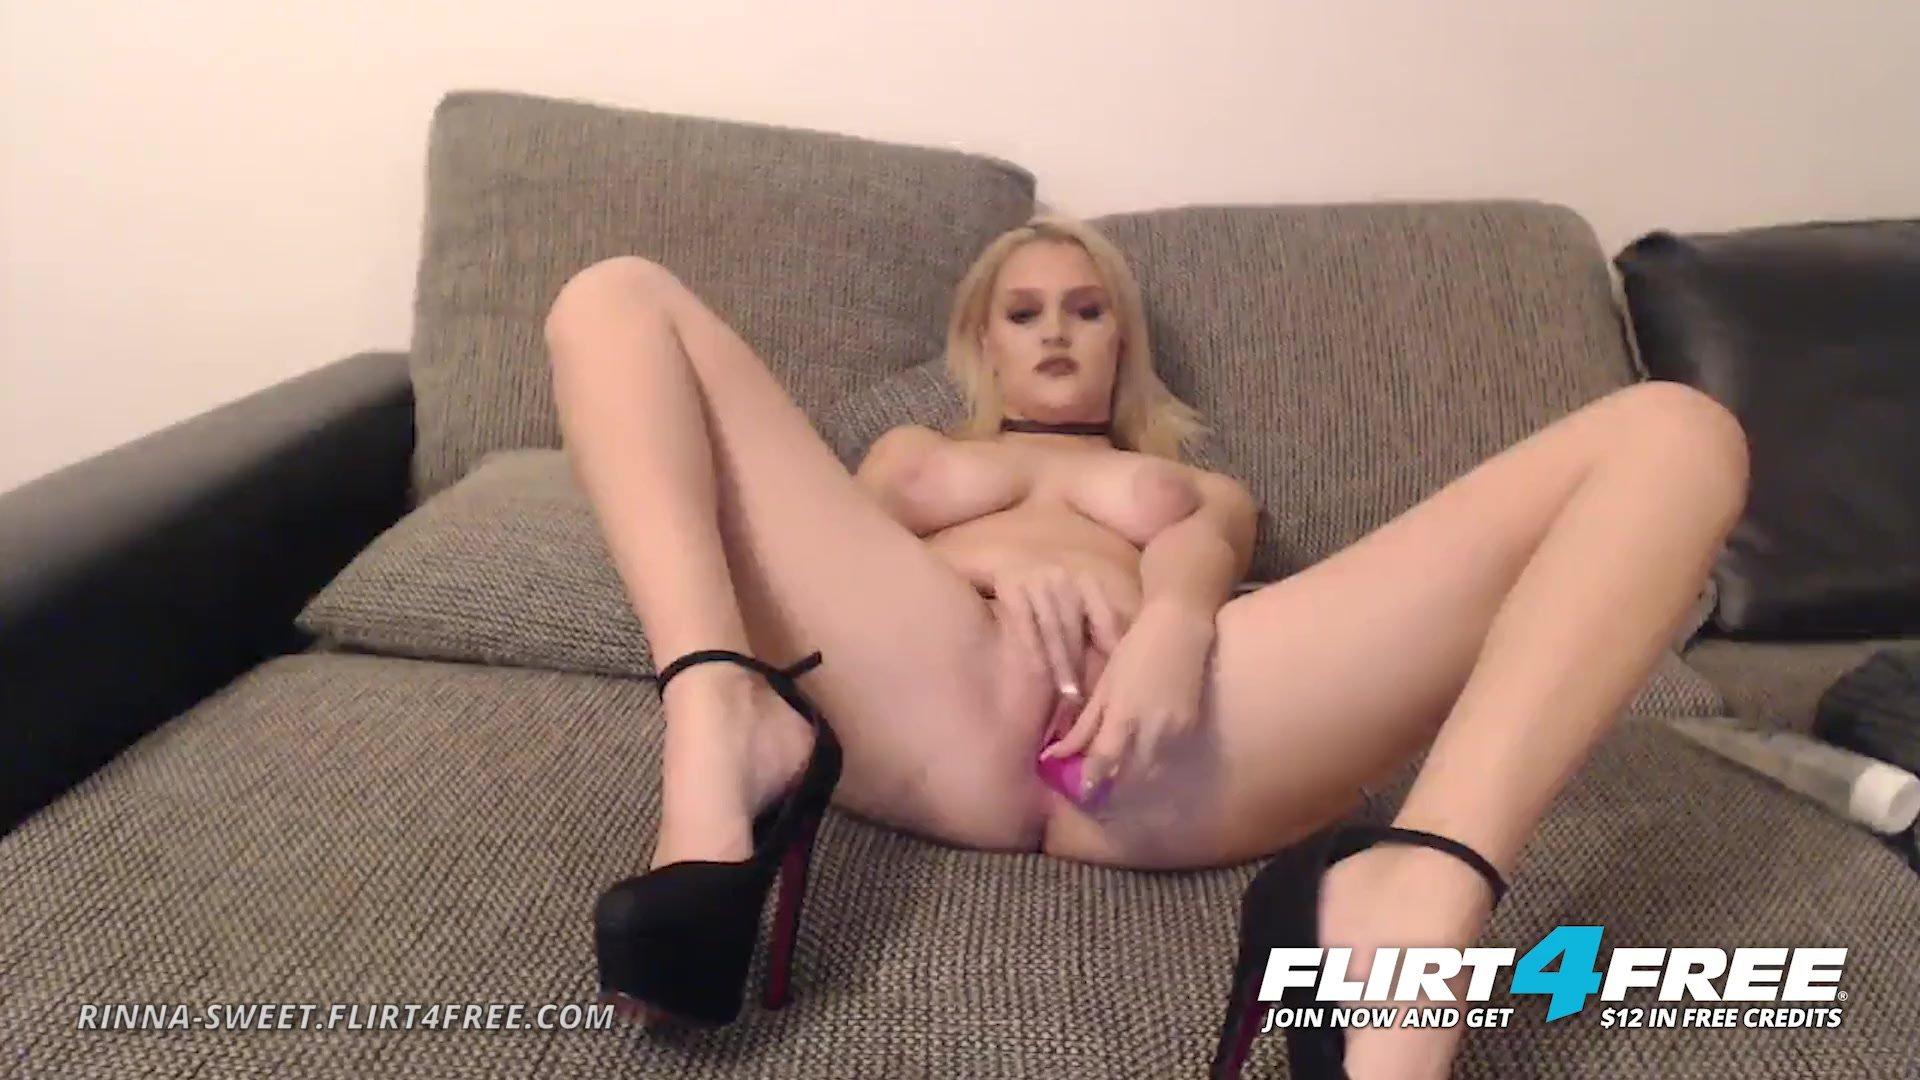 Rinna Sweet on Flirt4Free - Sweet Blonde Euro Babe Makes Her Wet Pussy Cum